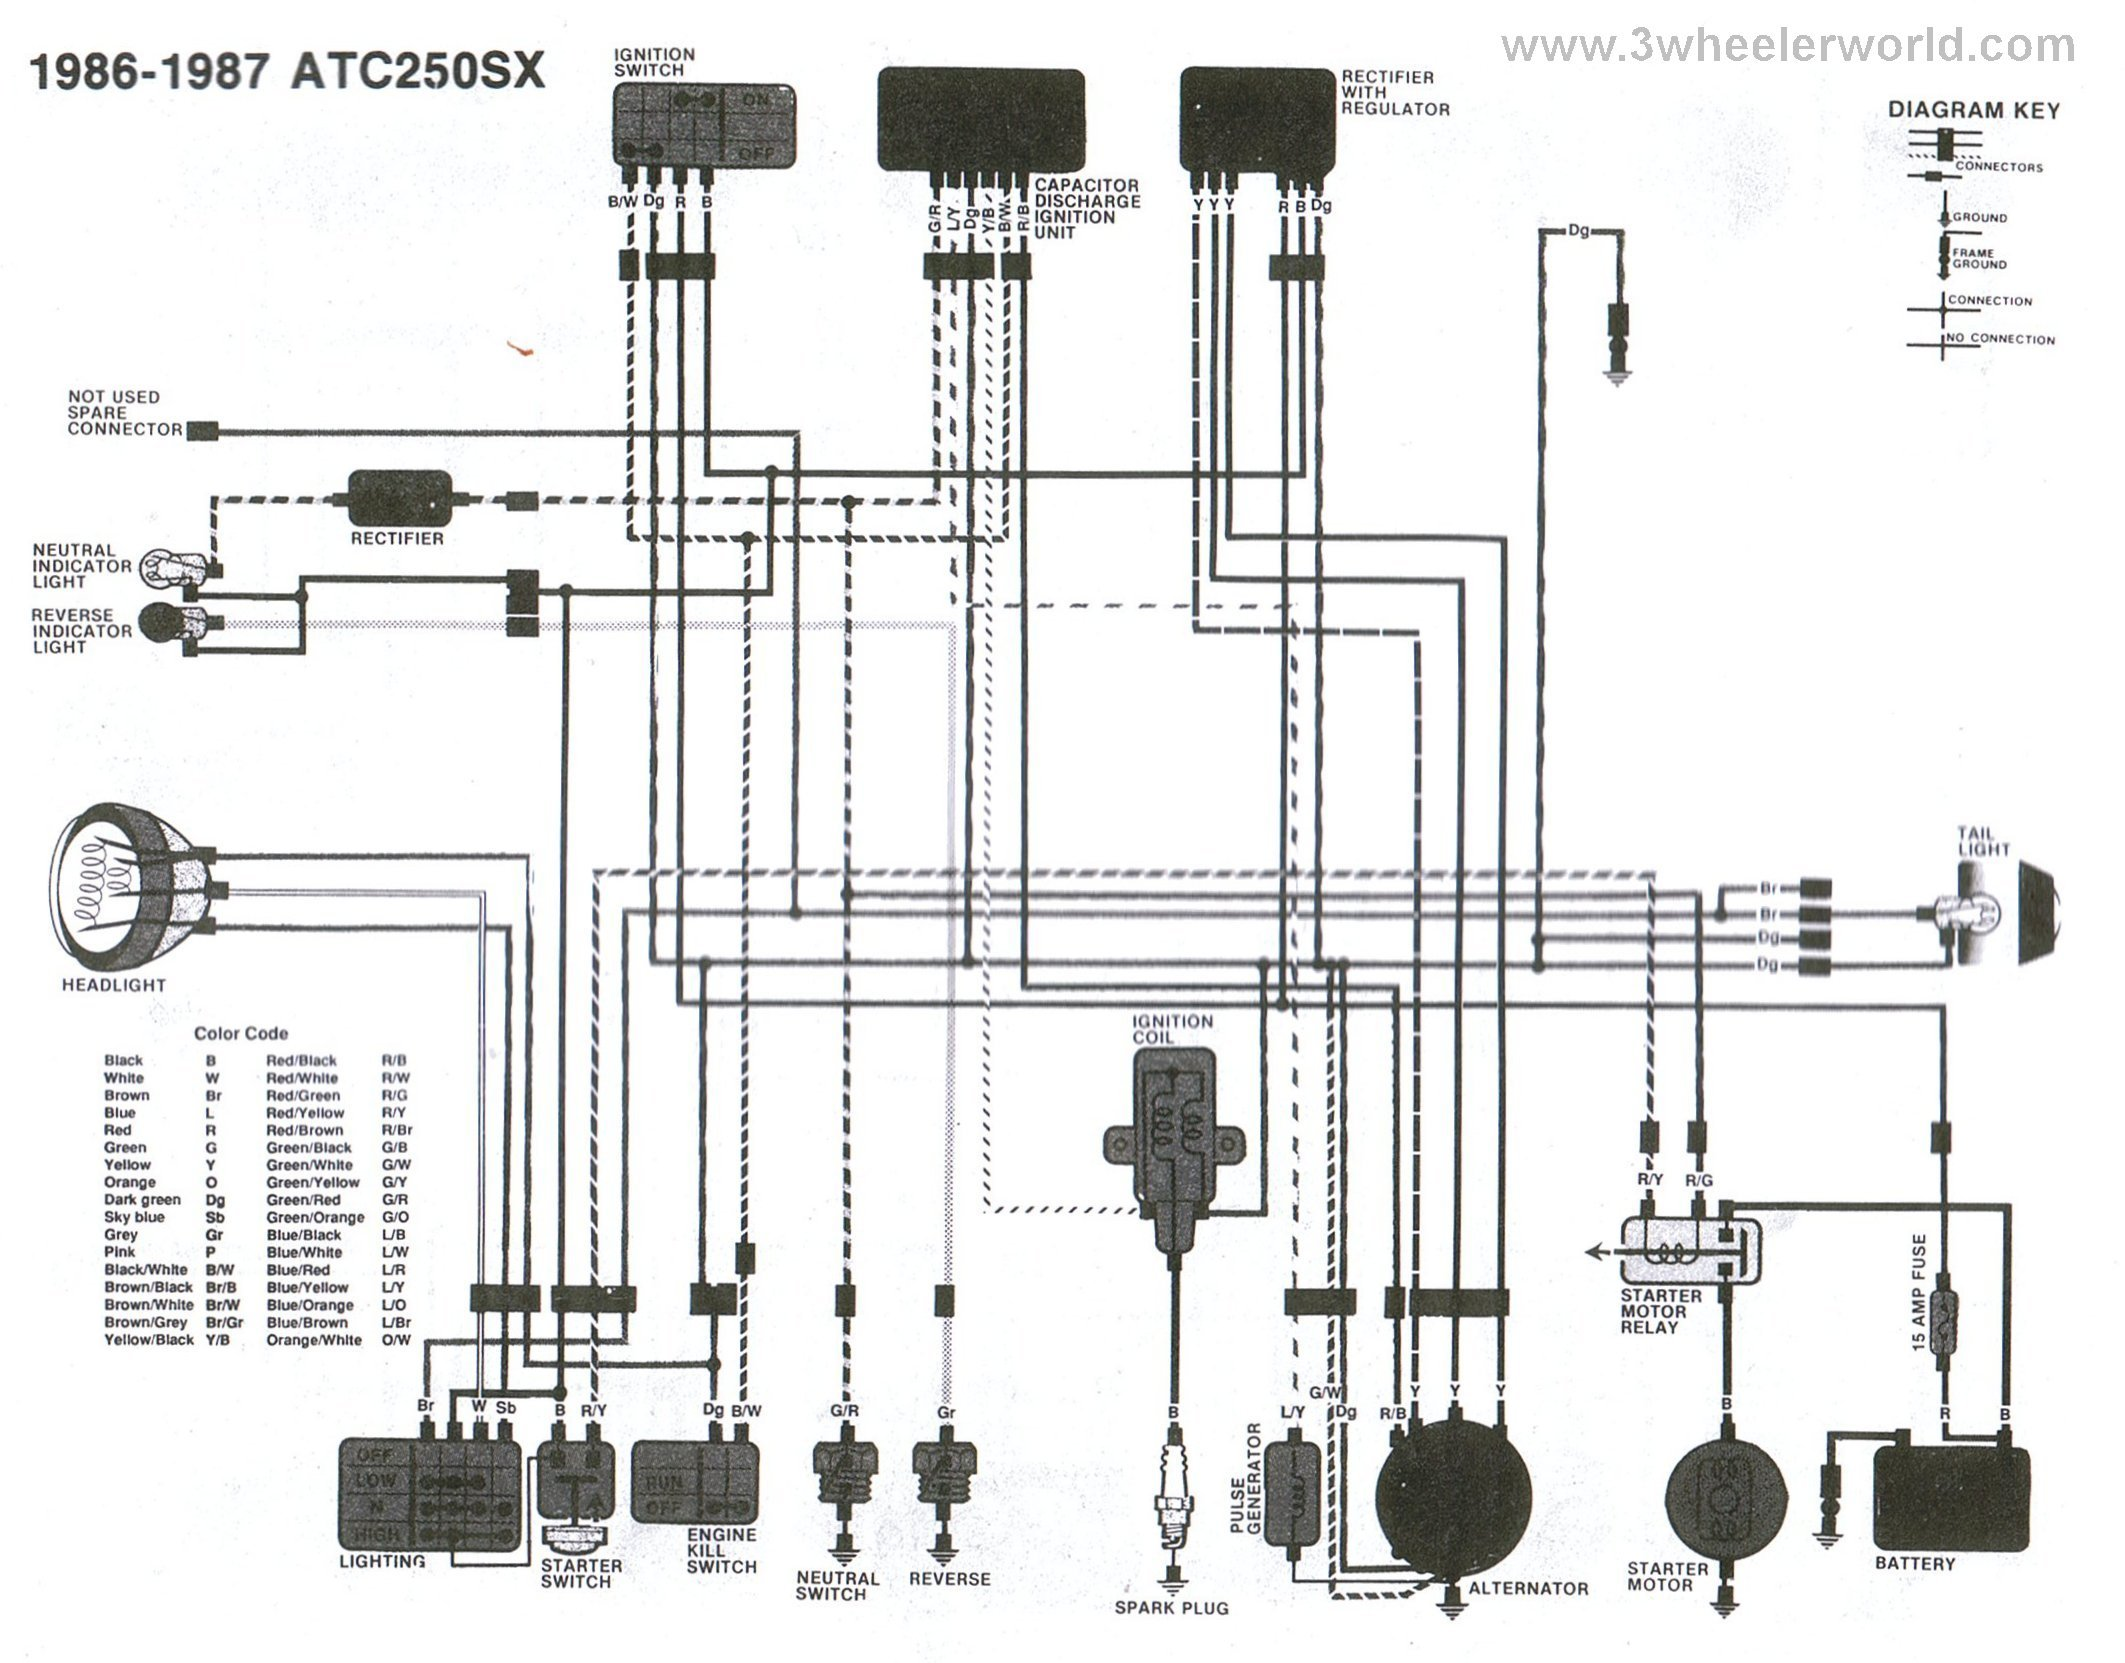 Atc 90 K3 Wiring Diagram - Baldor Industrial Motor Wiring Diagram -  jaguars.ajingemut.decorresine.itWiring Diagram Resource